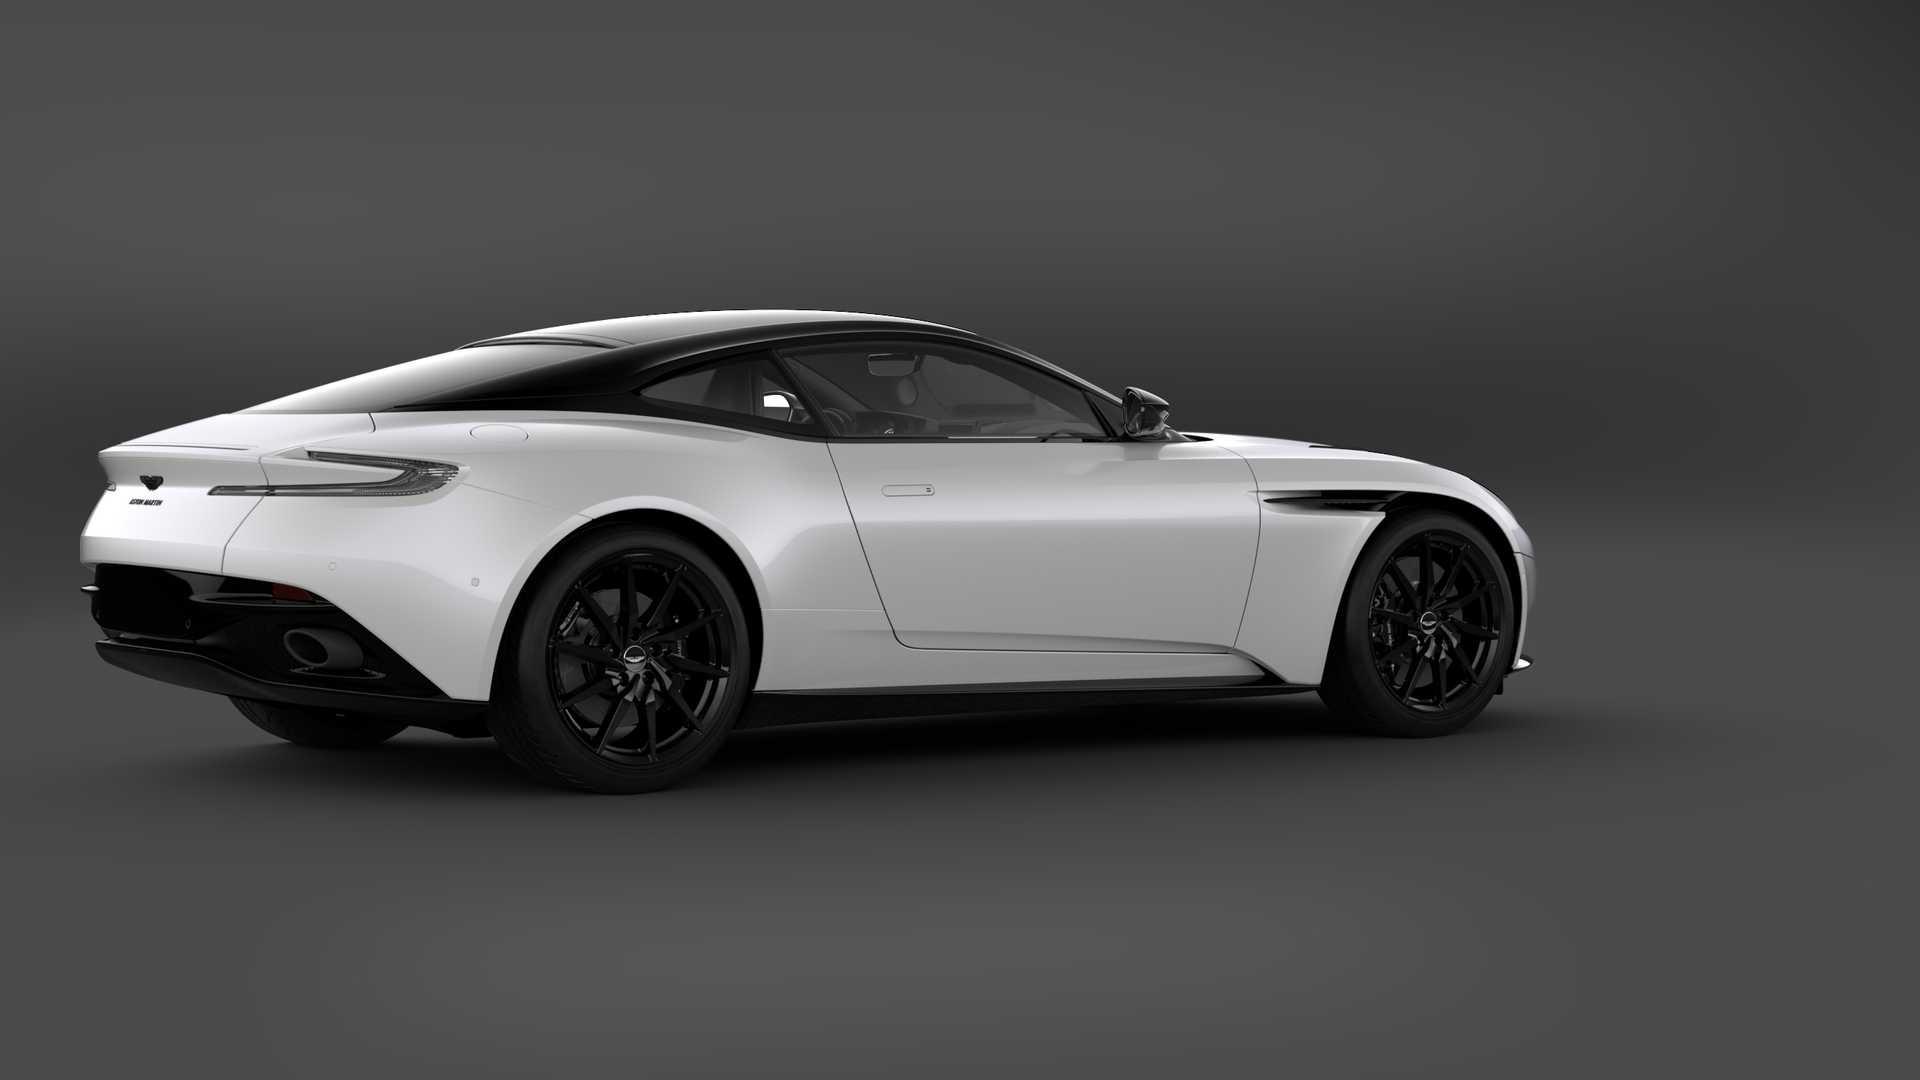 Aston-Martin-DB11-V8-Shadow-Edition-12